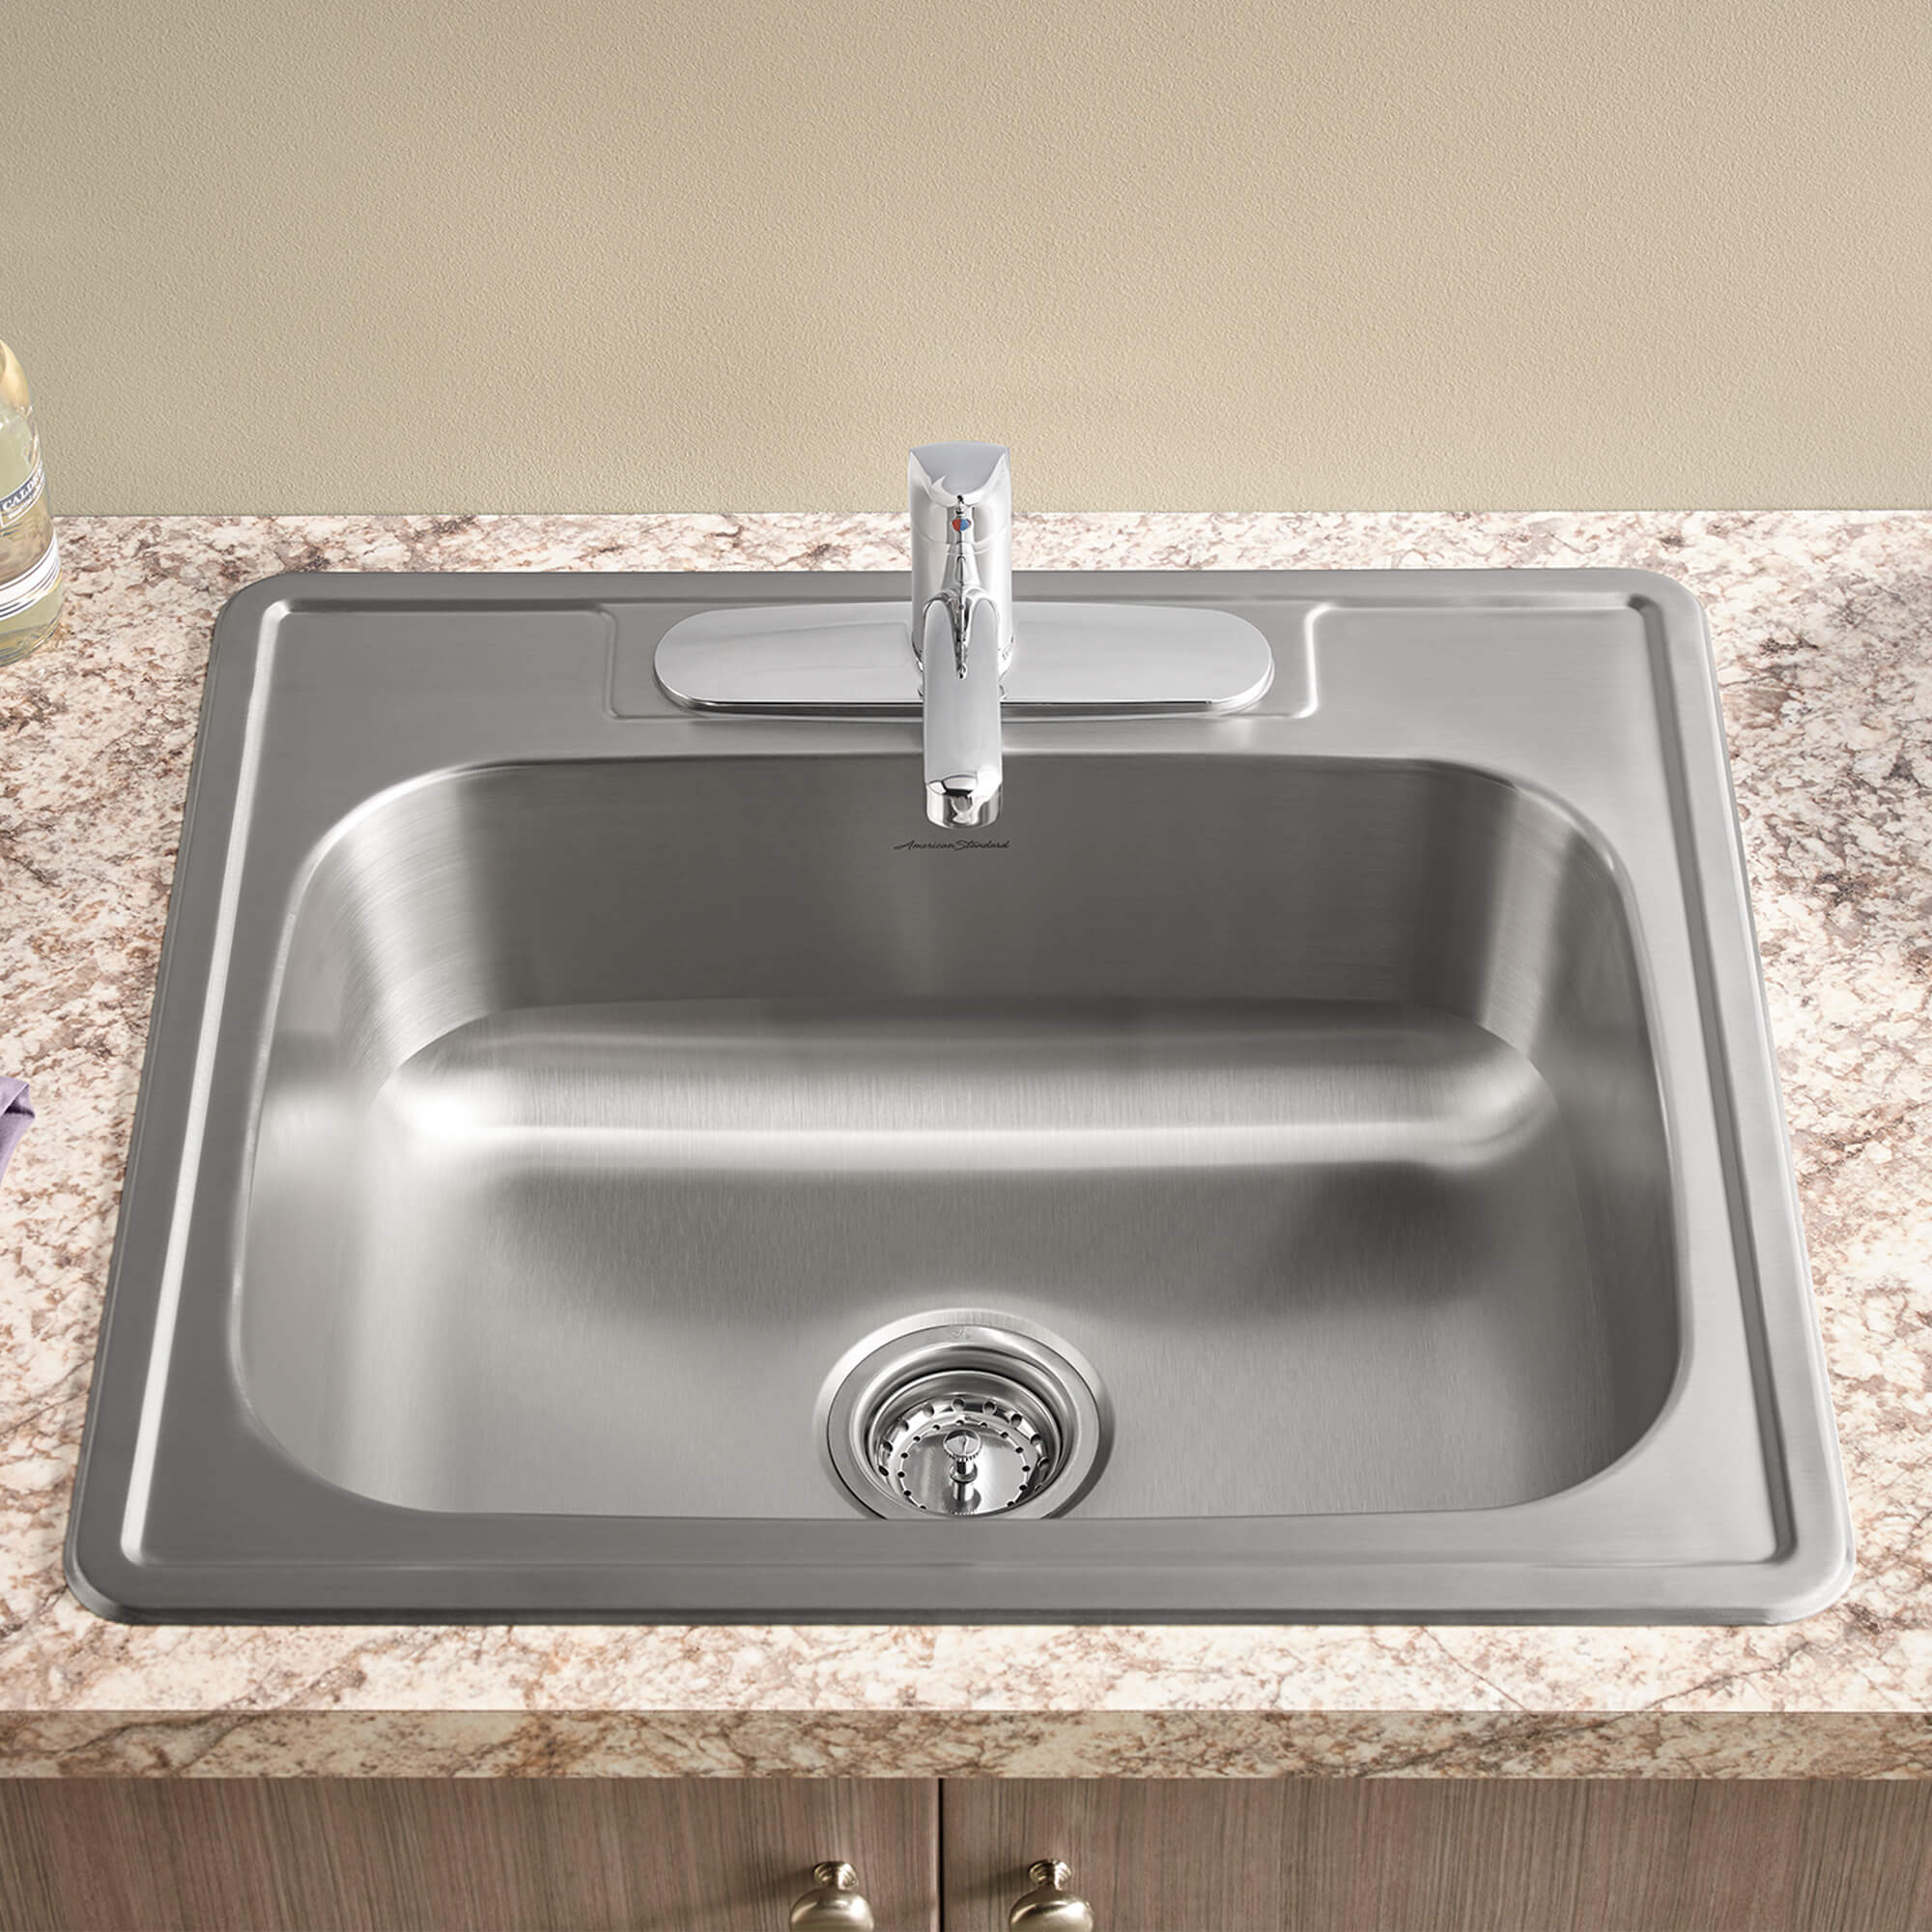 Colony Pro Kitchen Faucet